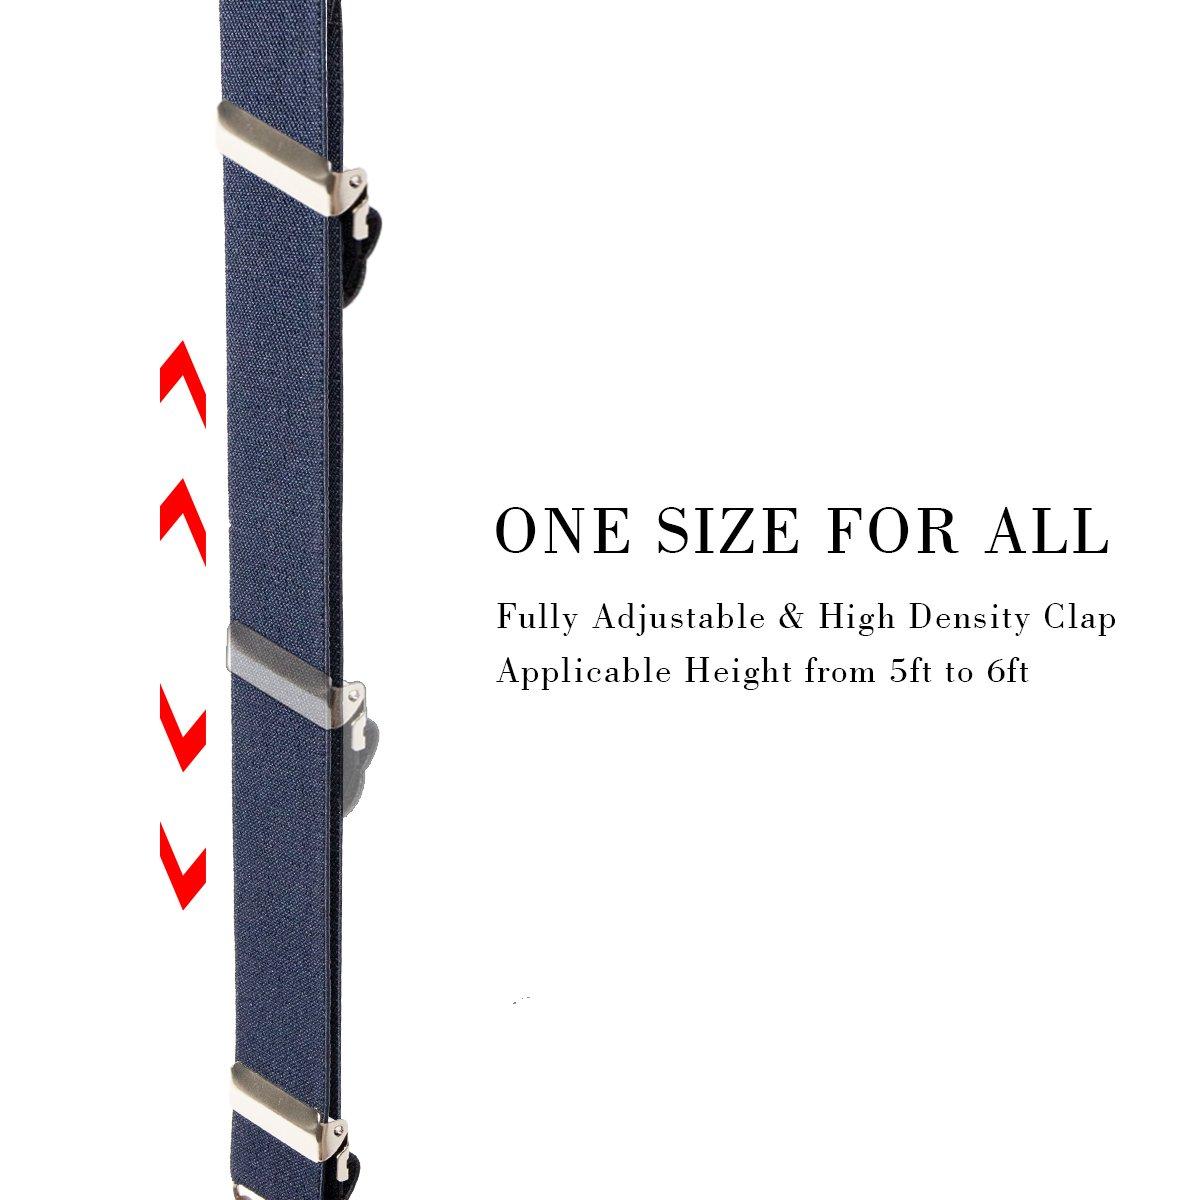 KANGDAI Bretelle Uomo Bretelle per uomo 4 fibbie X dietro a righe Uomo Bretelle durevoli Bretelle regolabili elastiche Clip di metallo forte